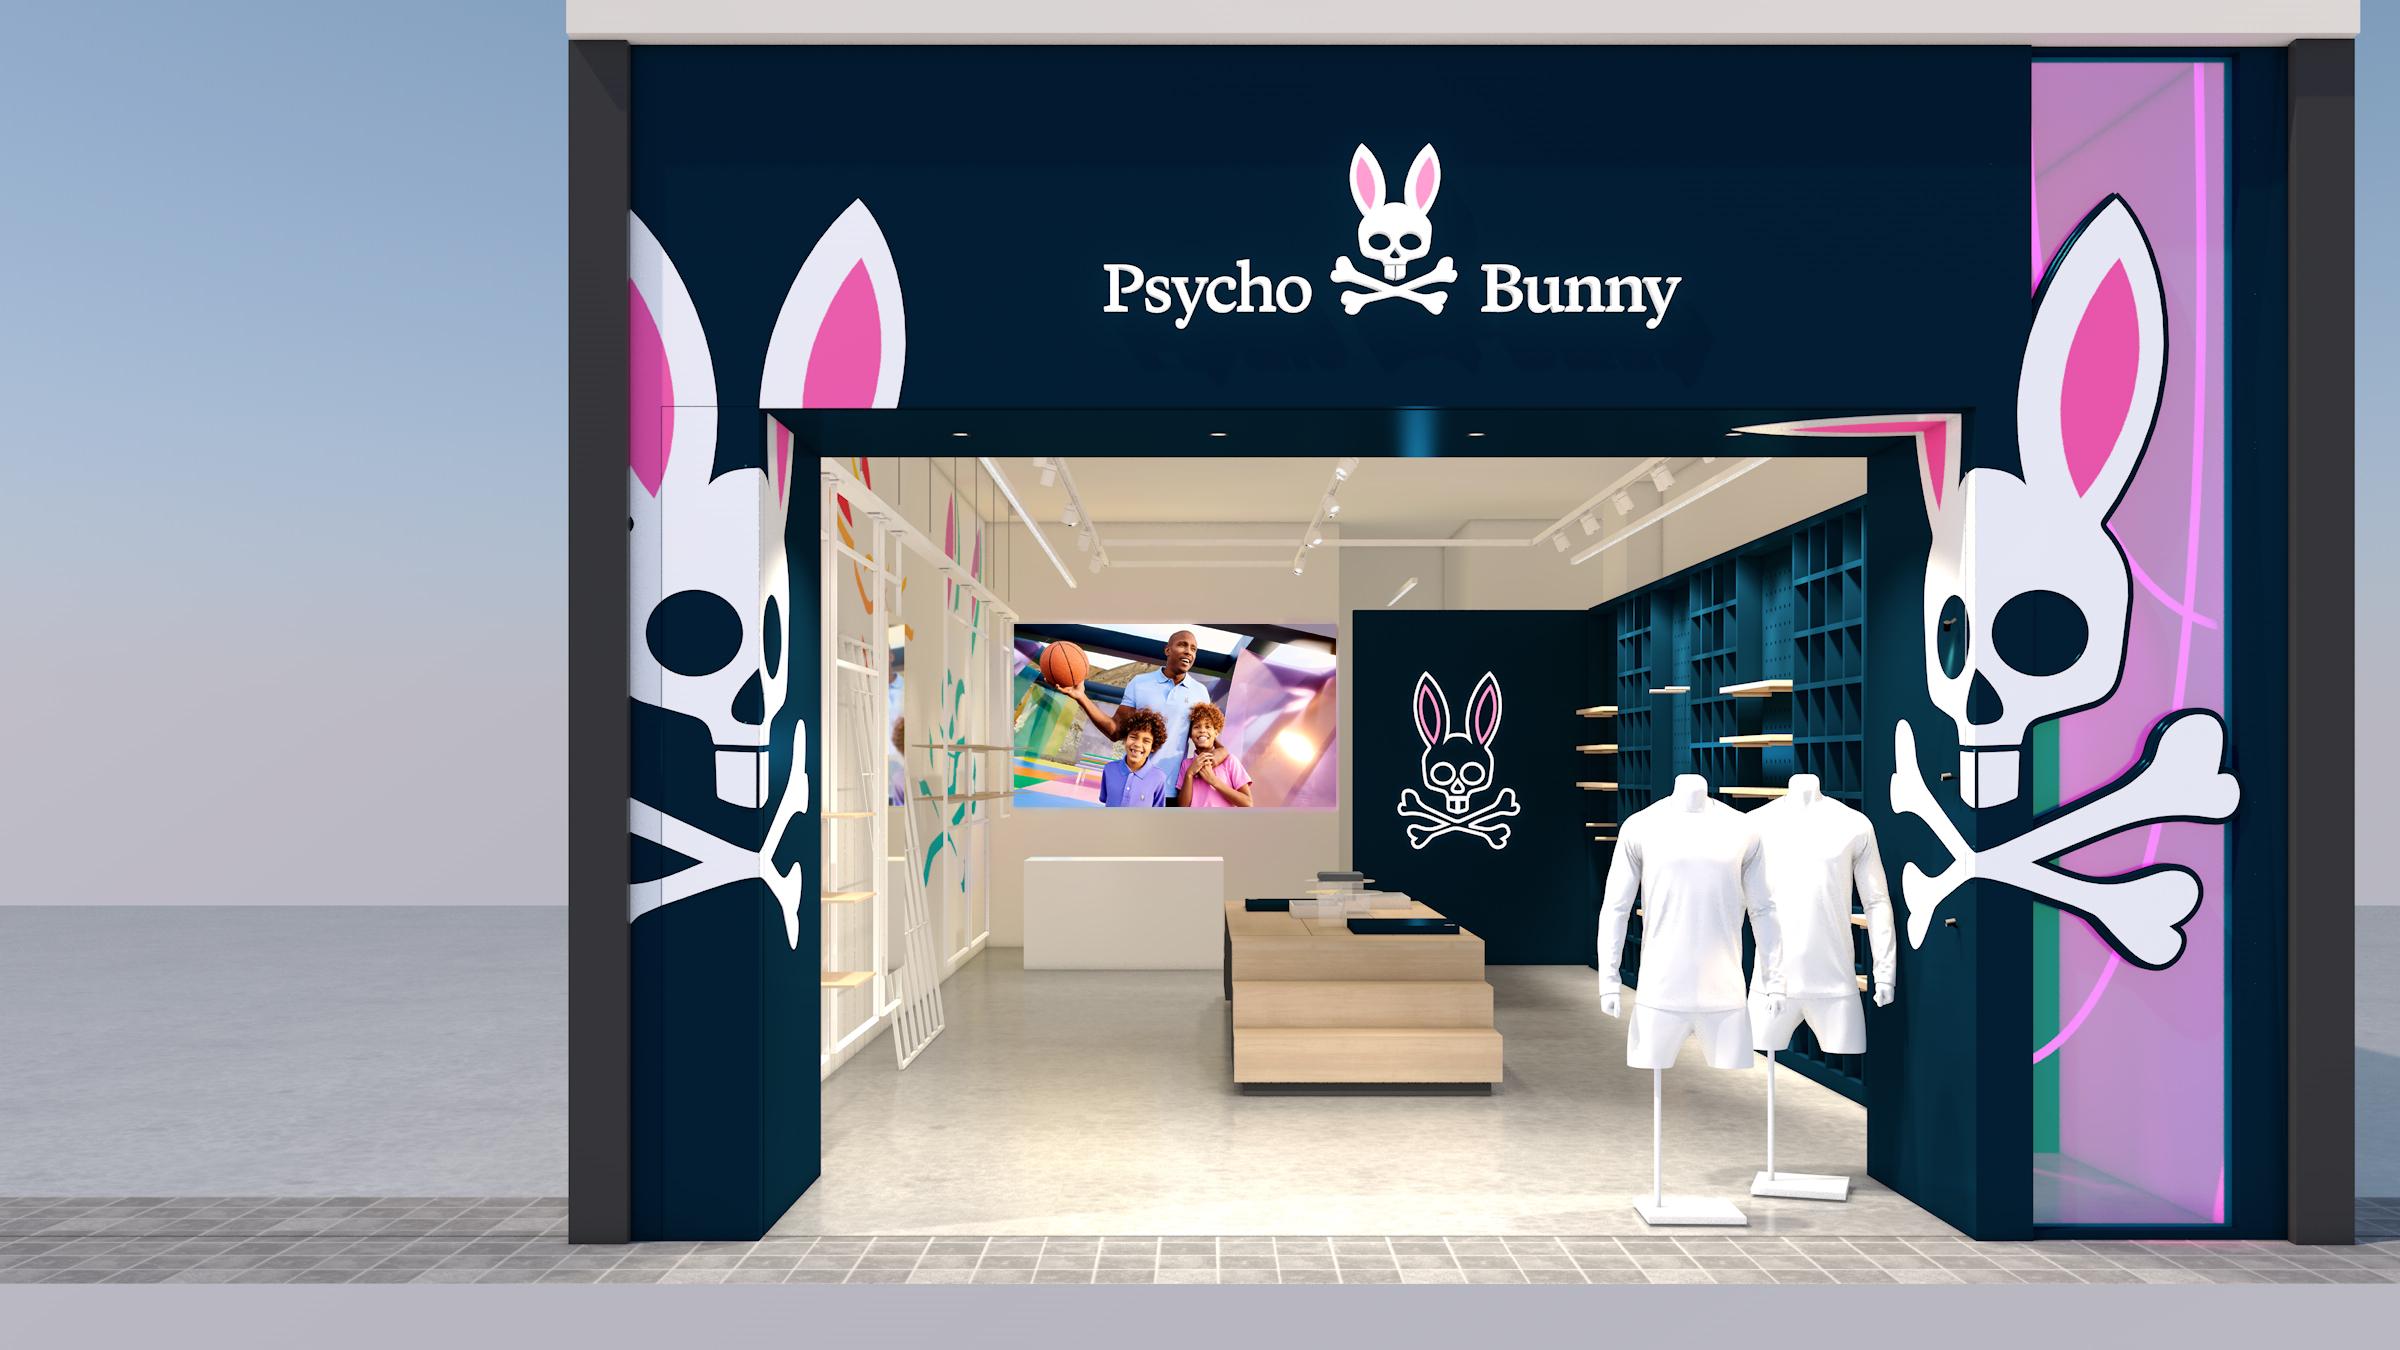 Psycho Bunny Century City, Calif.